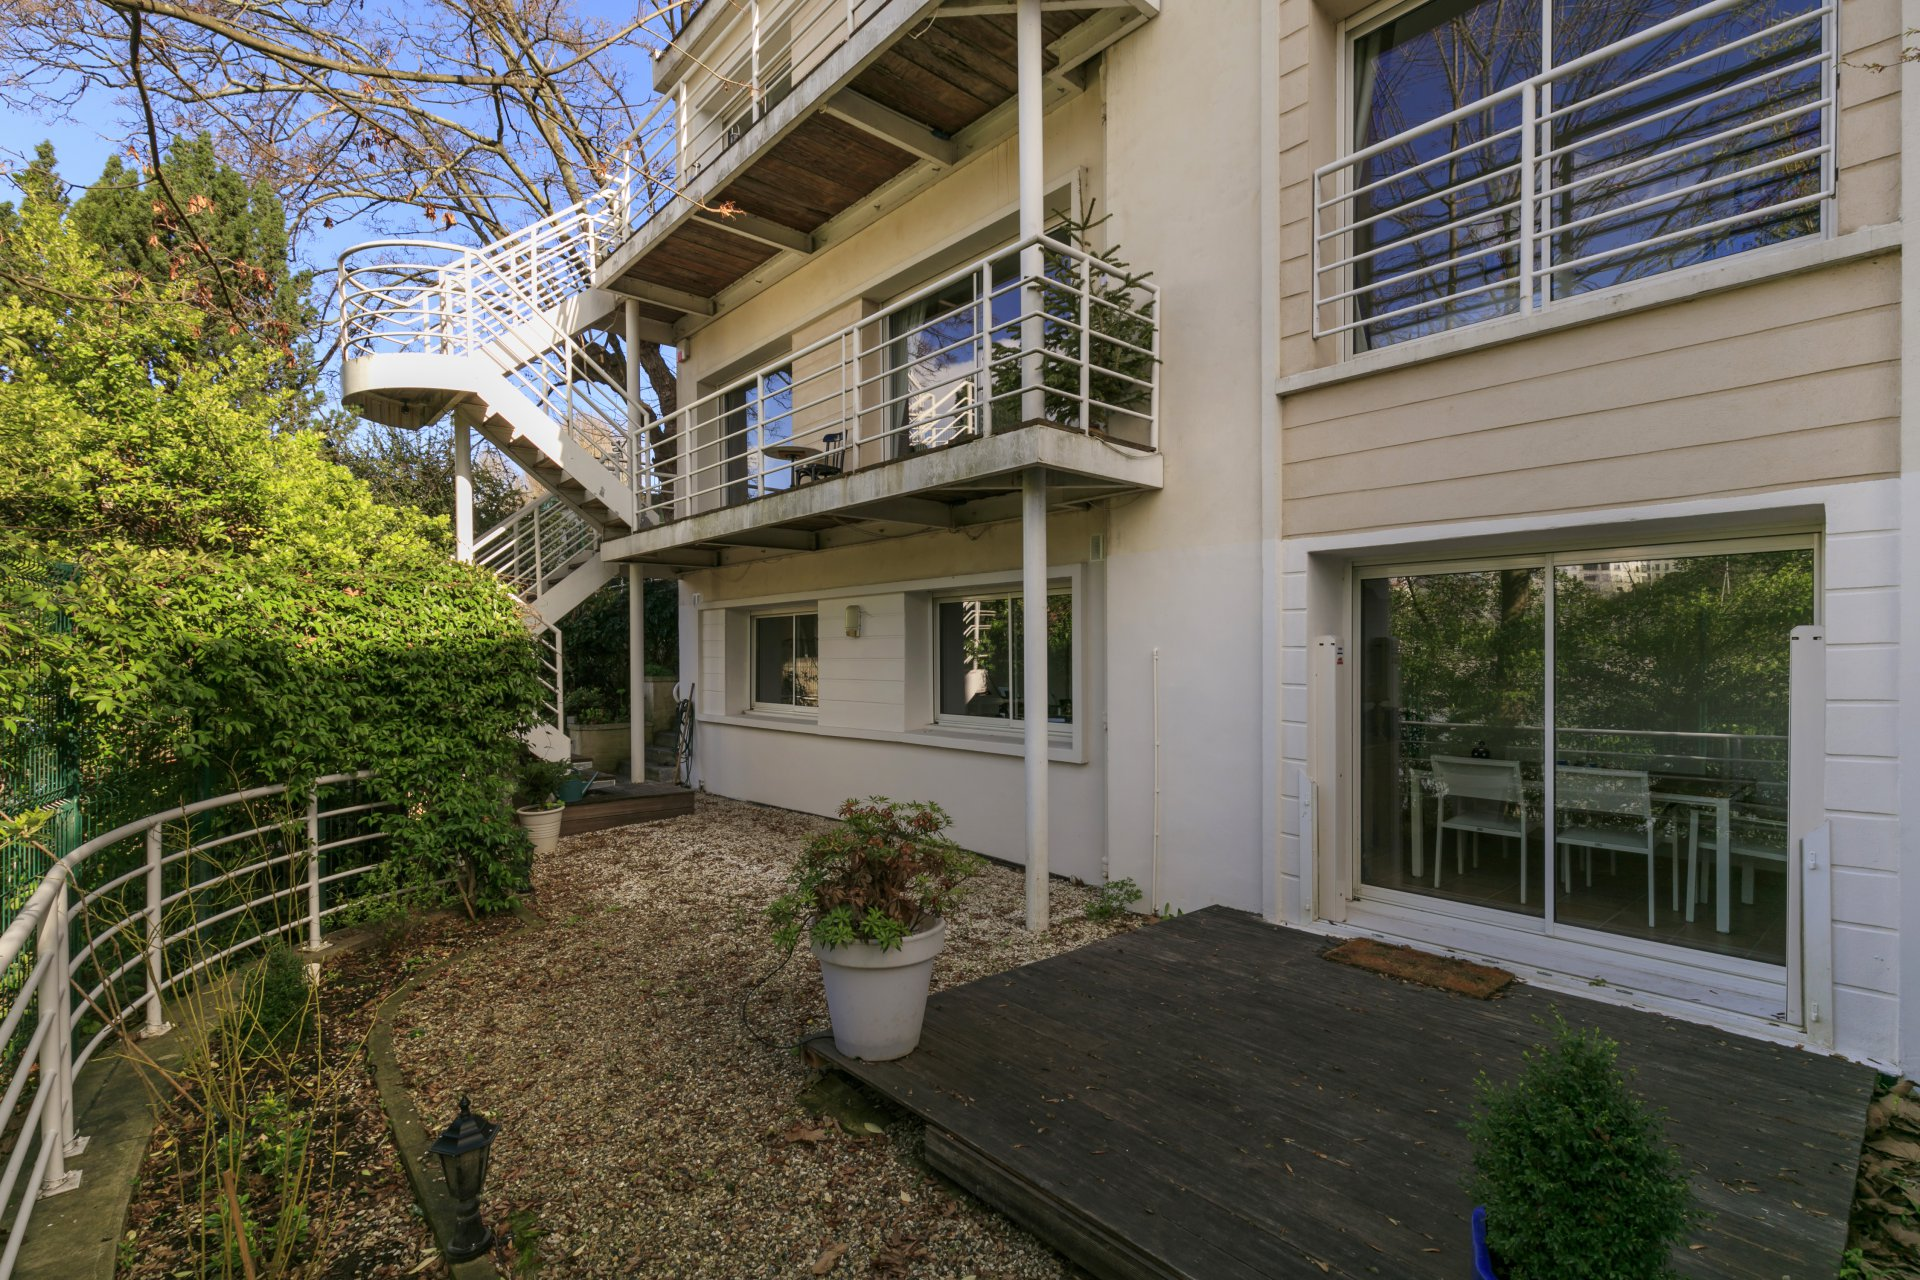 family-house-for-sale-balcony-exceptional-views-river-seine-garden-near-shops